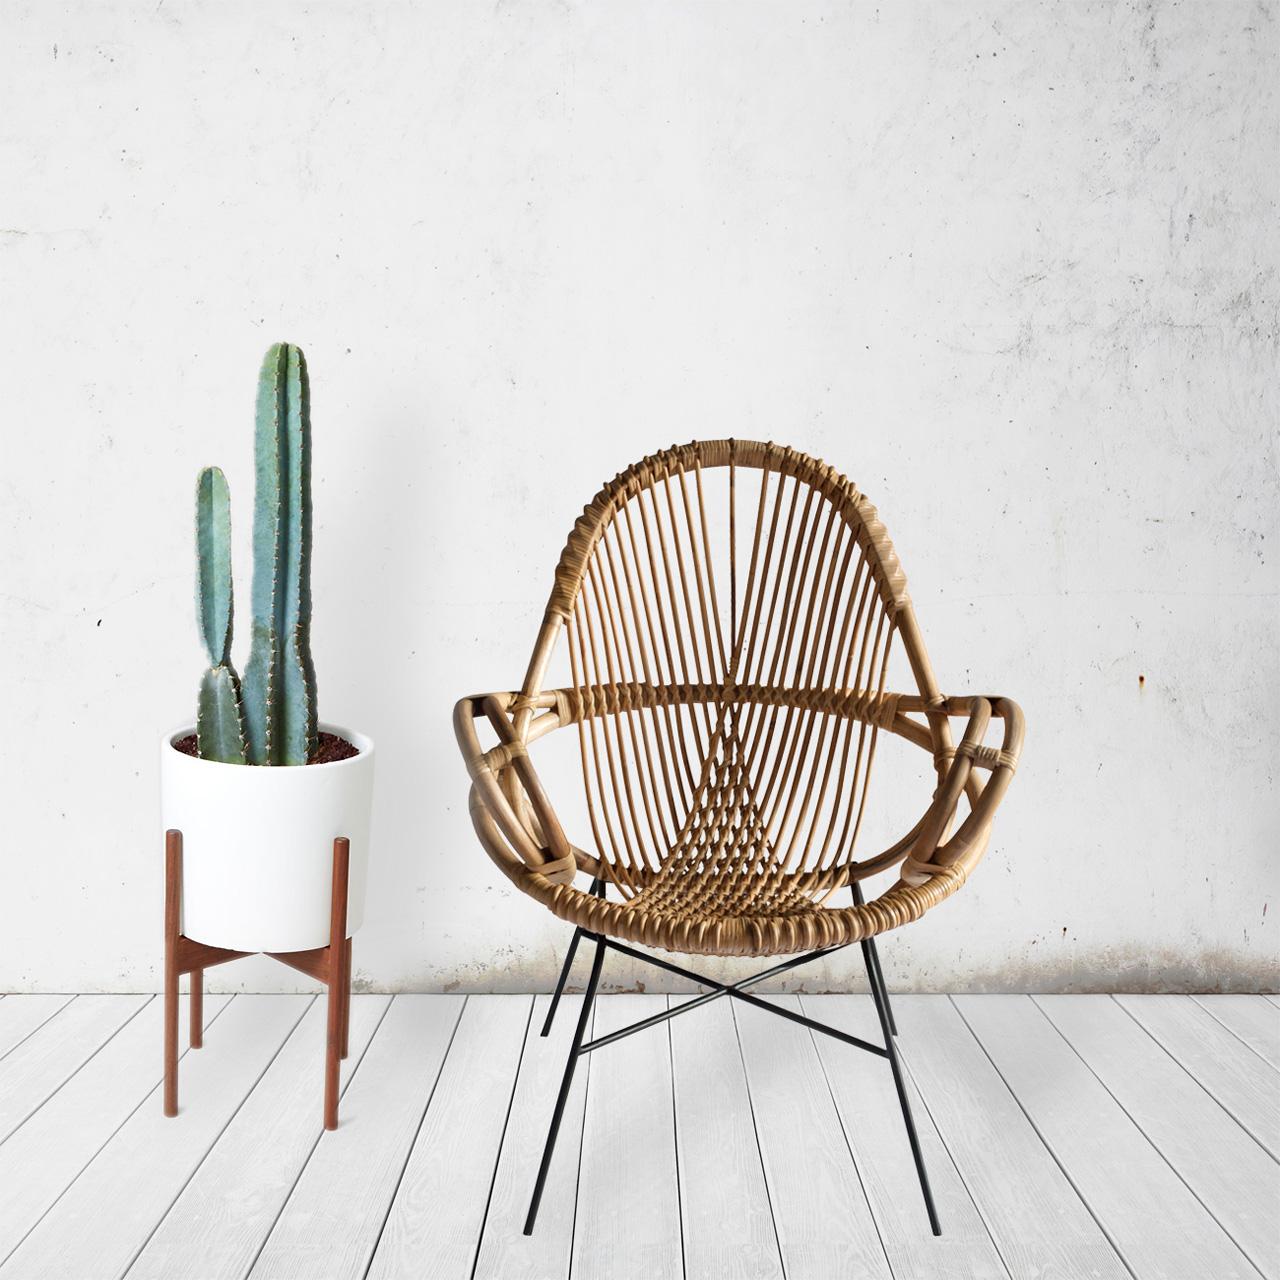 Modern Handwoven Rattan Chairs From Wend Design Milk